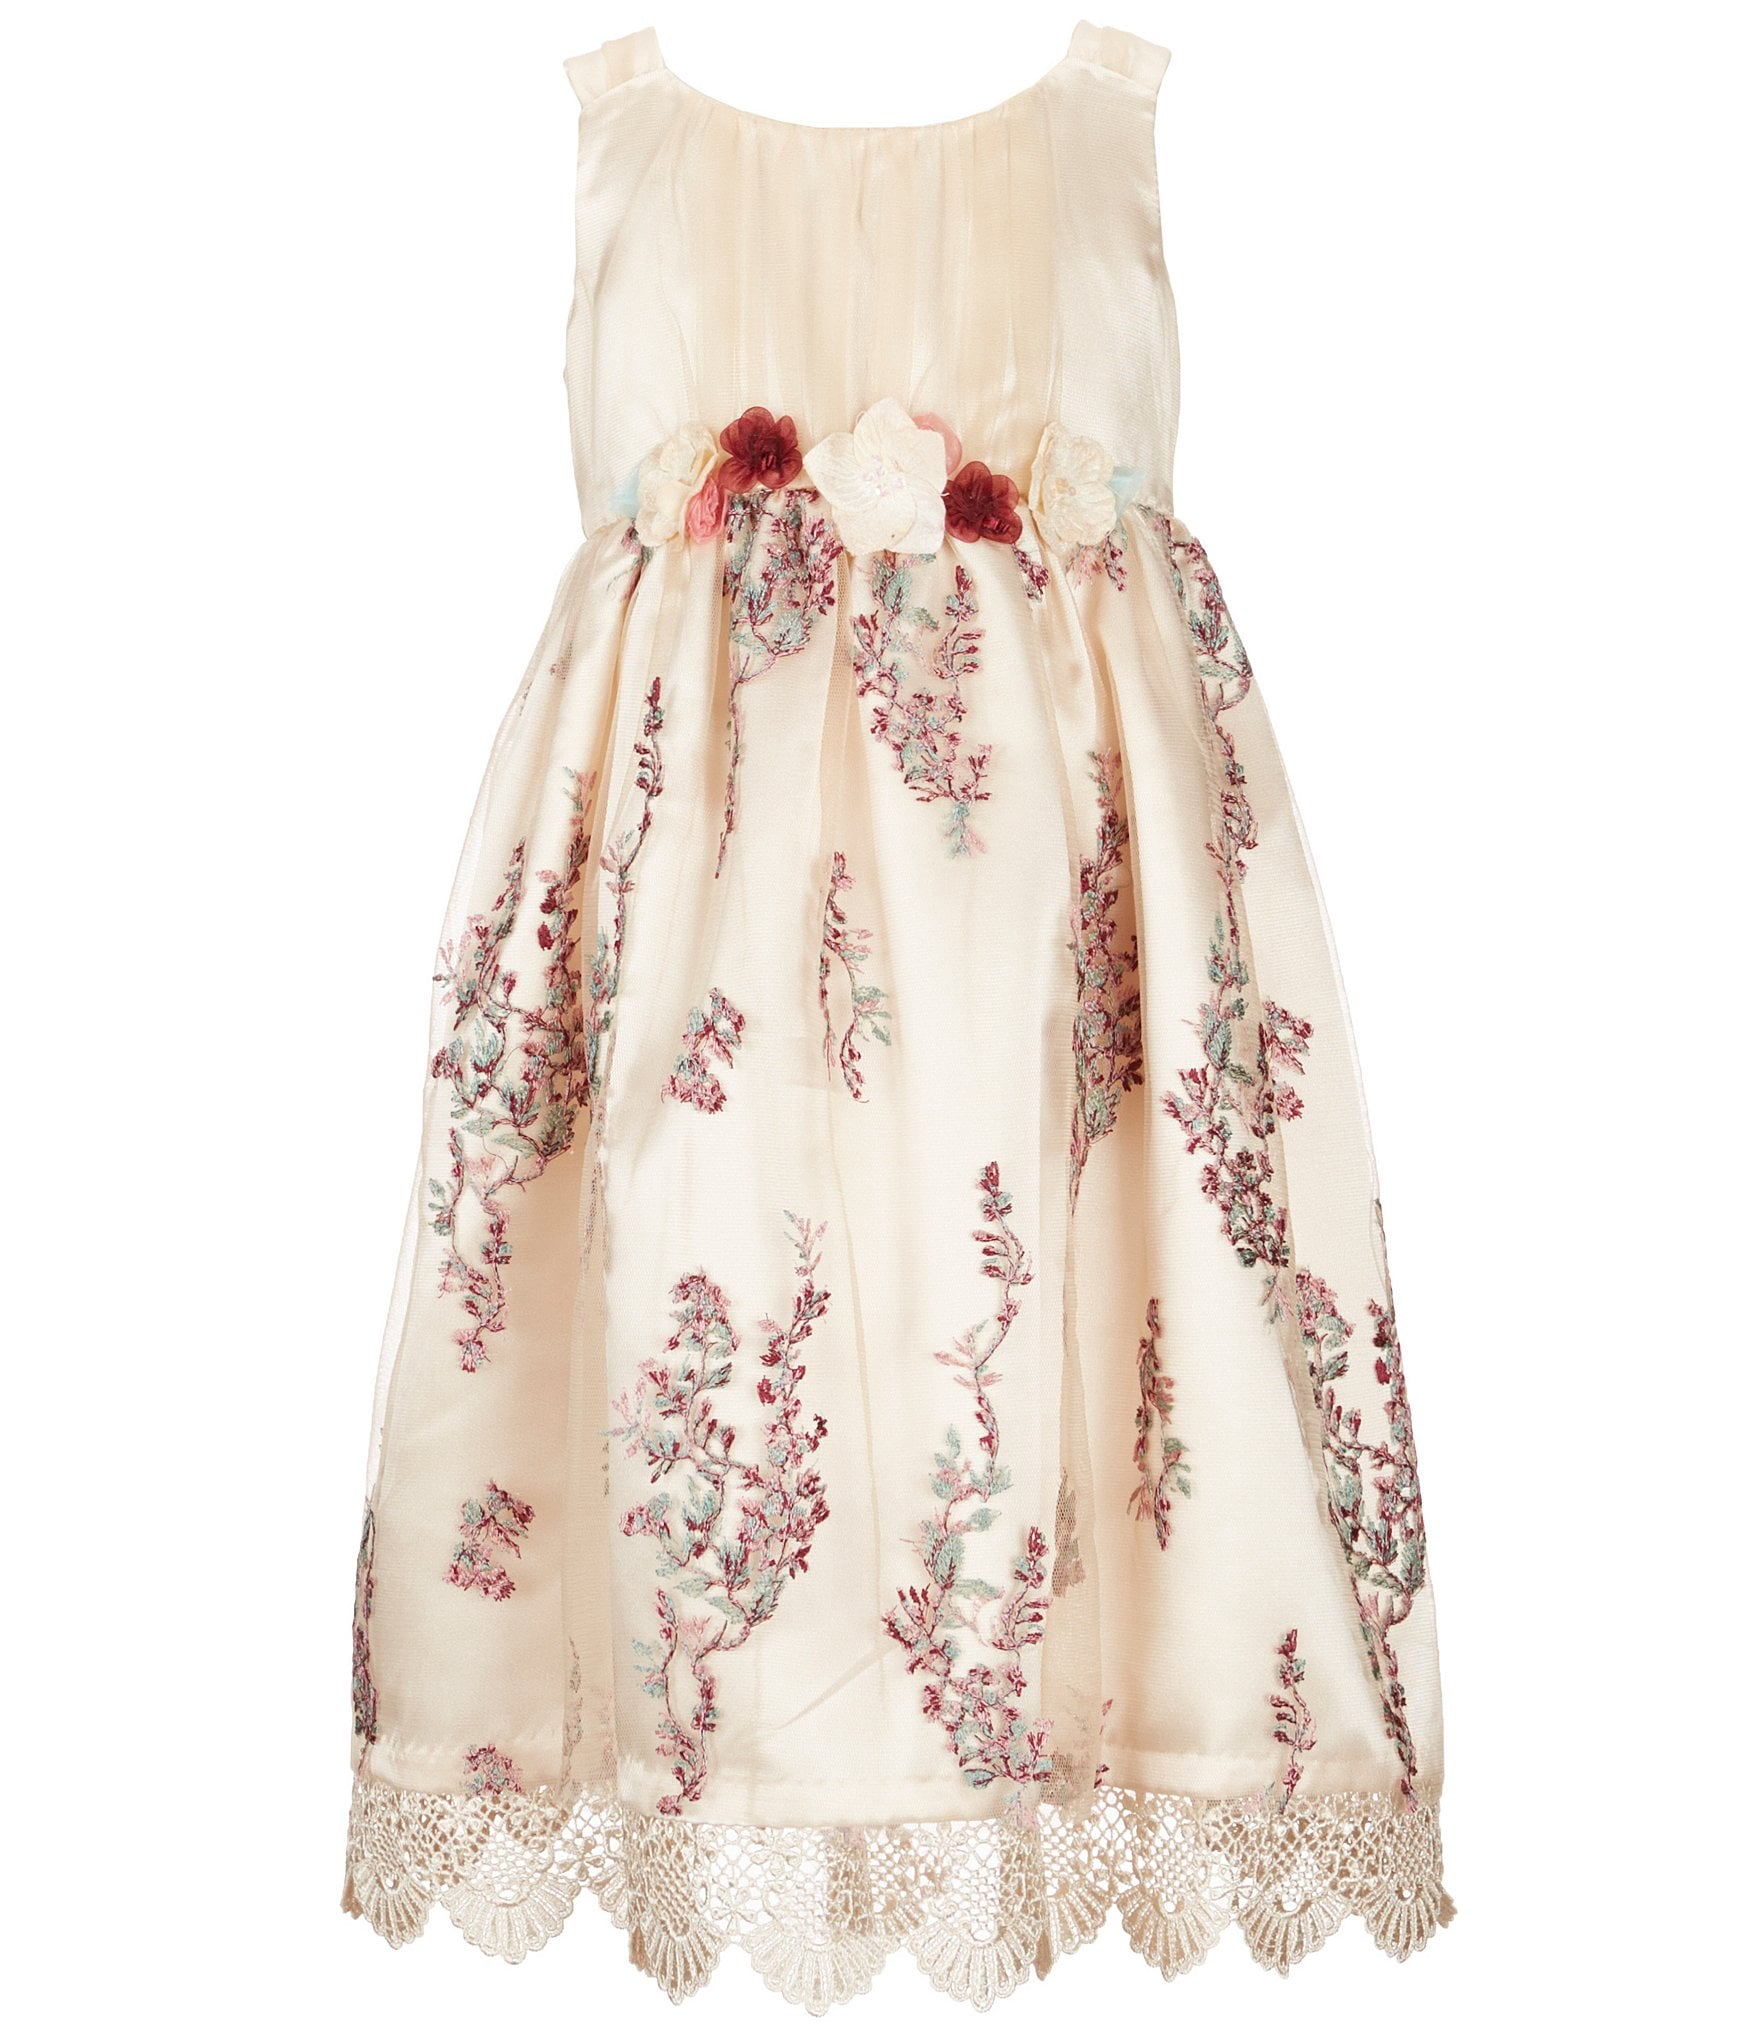 Bonnie Jean Little Girls 2T 6X Sleeveless Embroidered Mesh